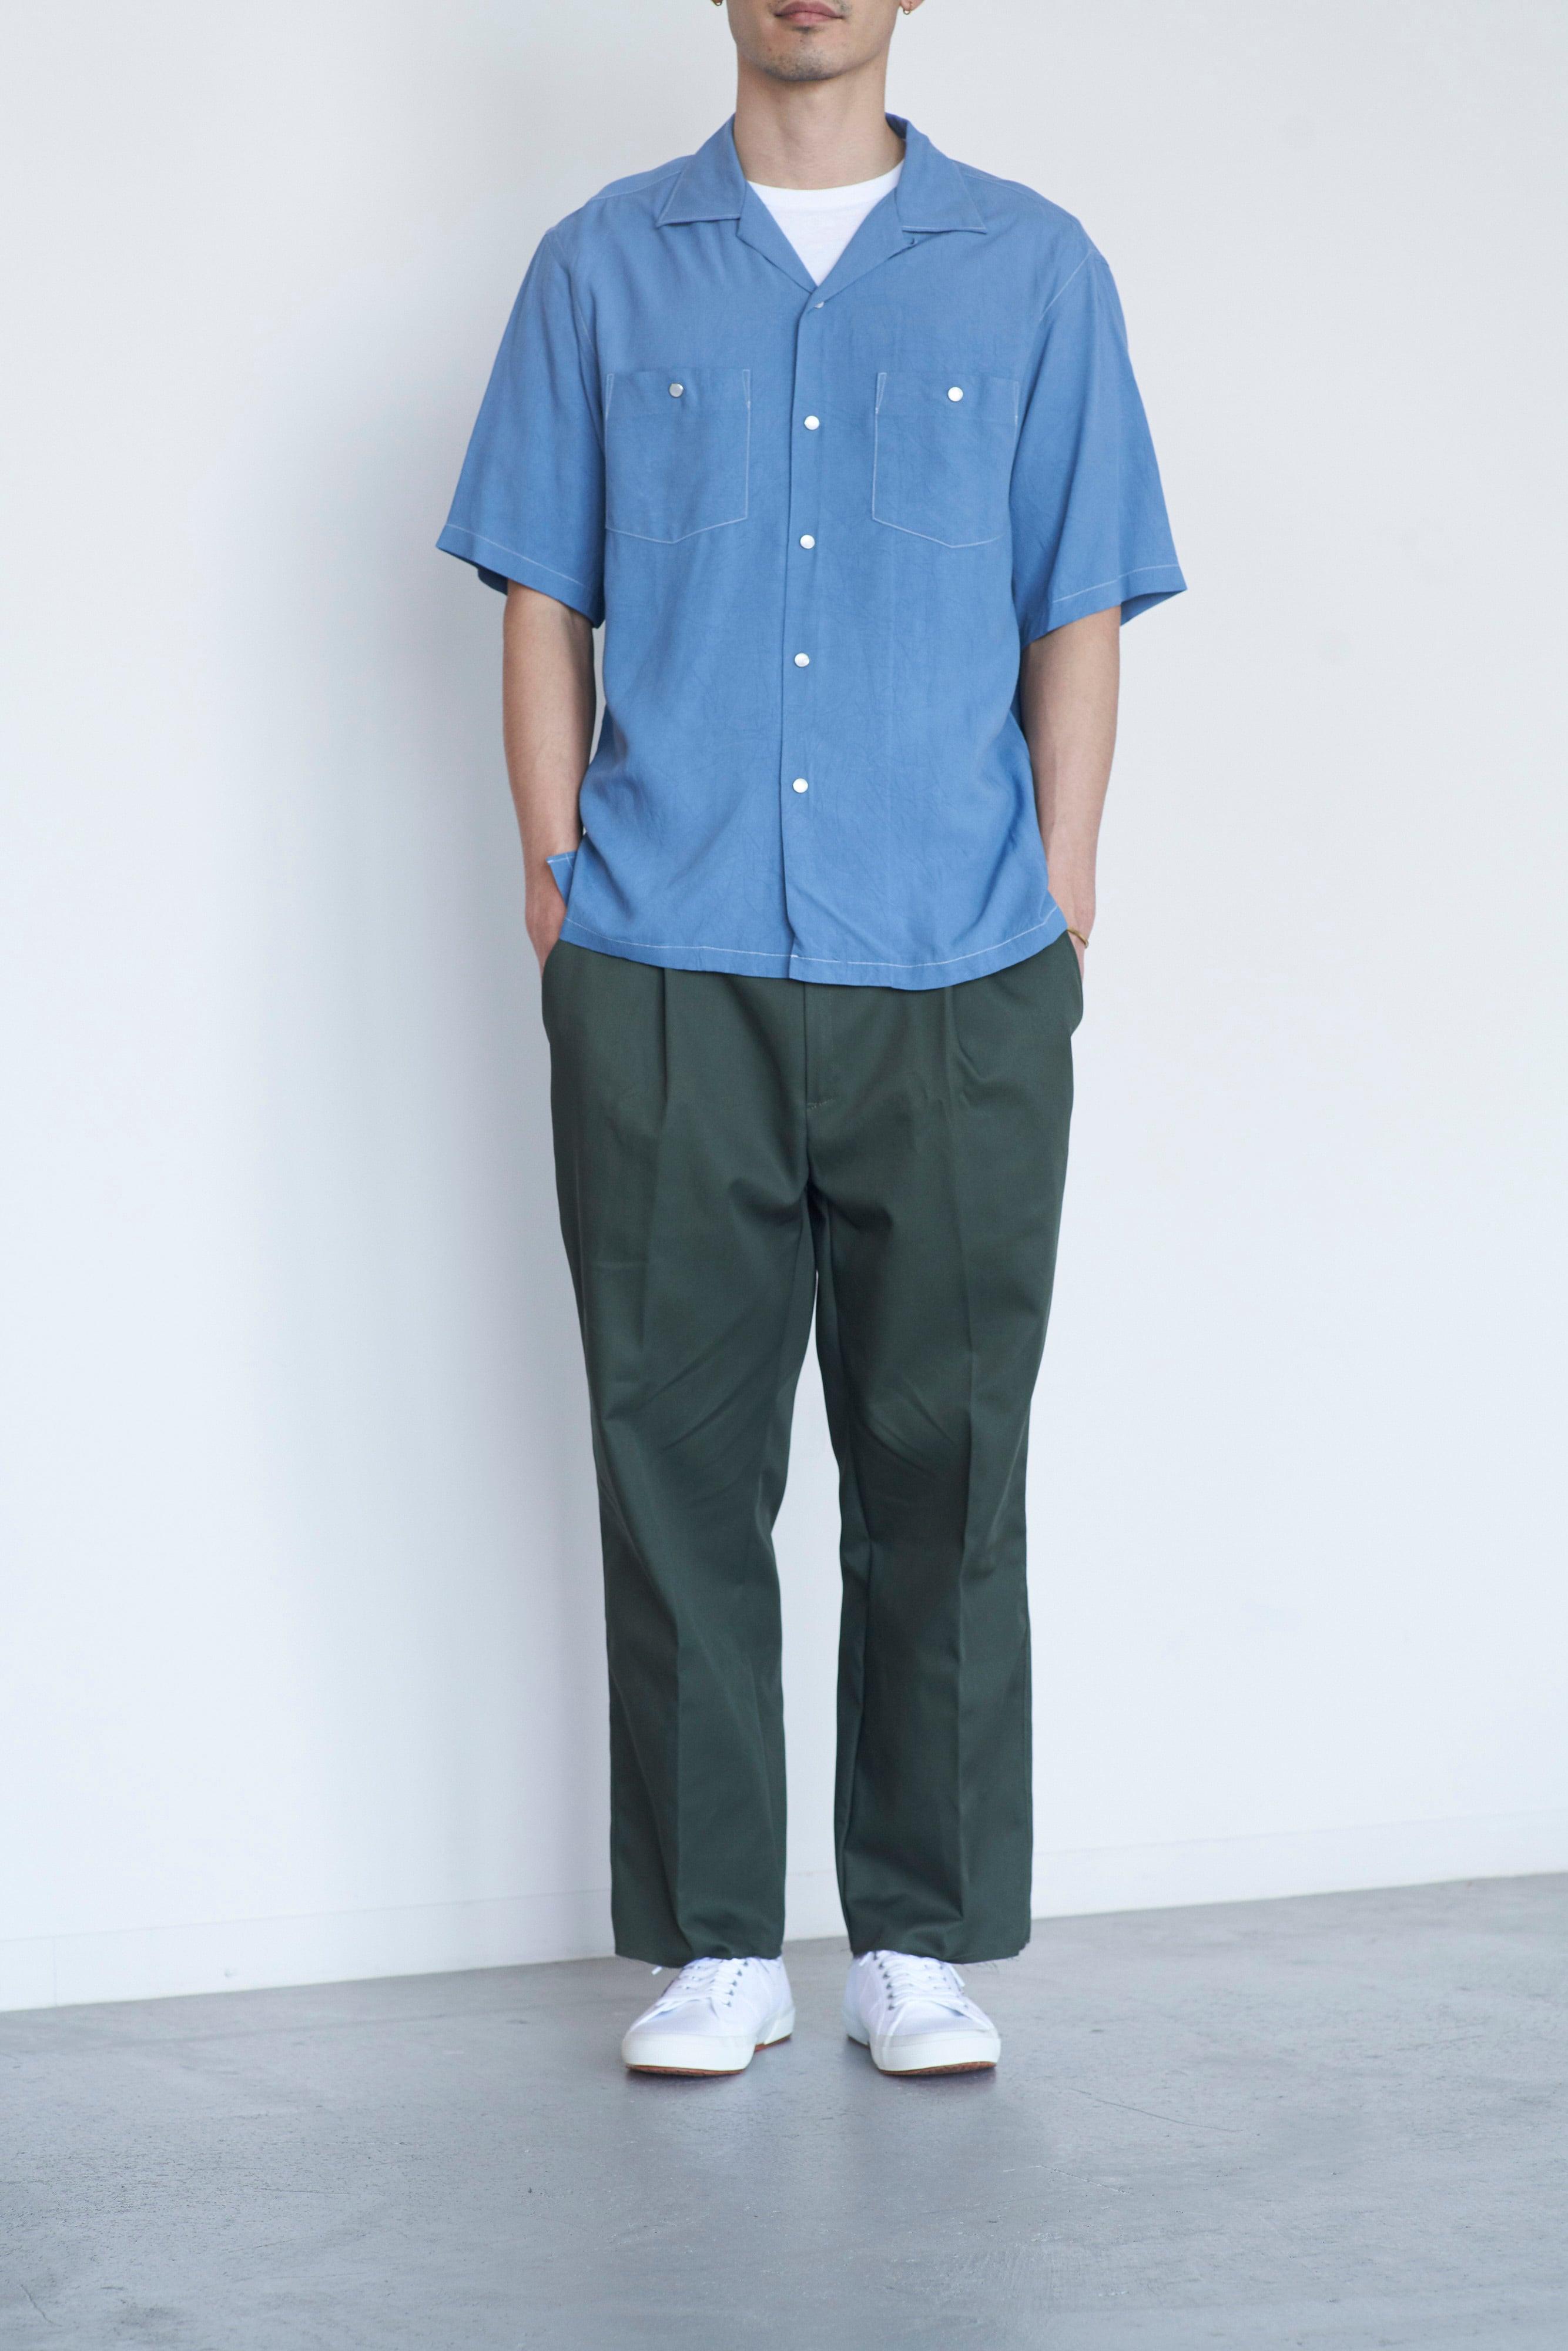 KABEL One-Up Wst Shirt